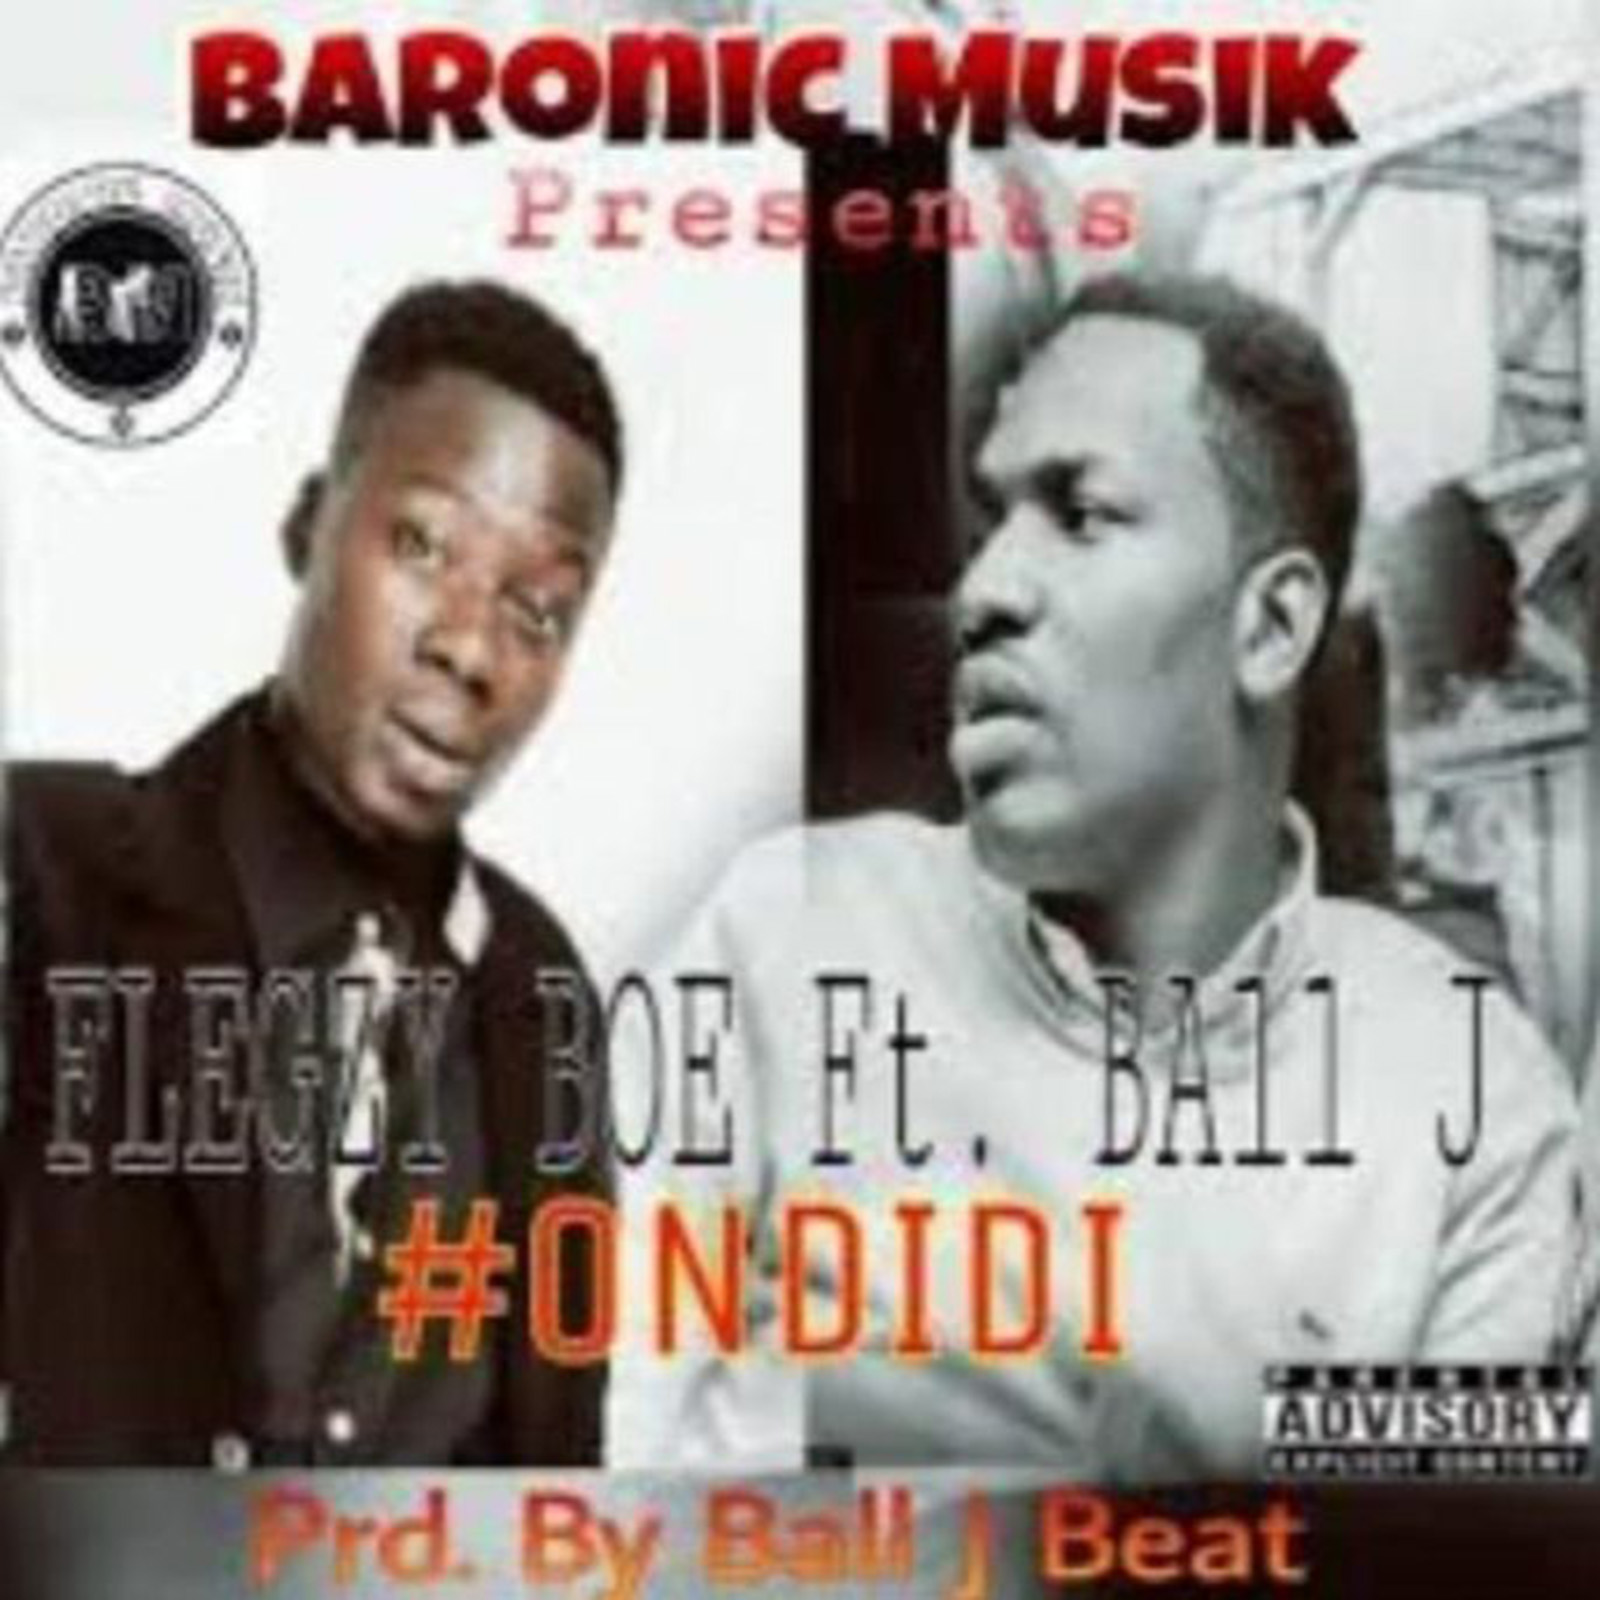 Ondidi by Flegzy Boe feat. Ball J